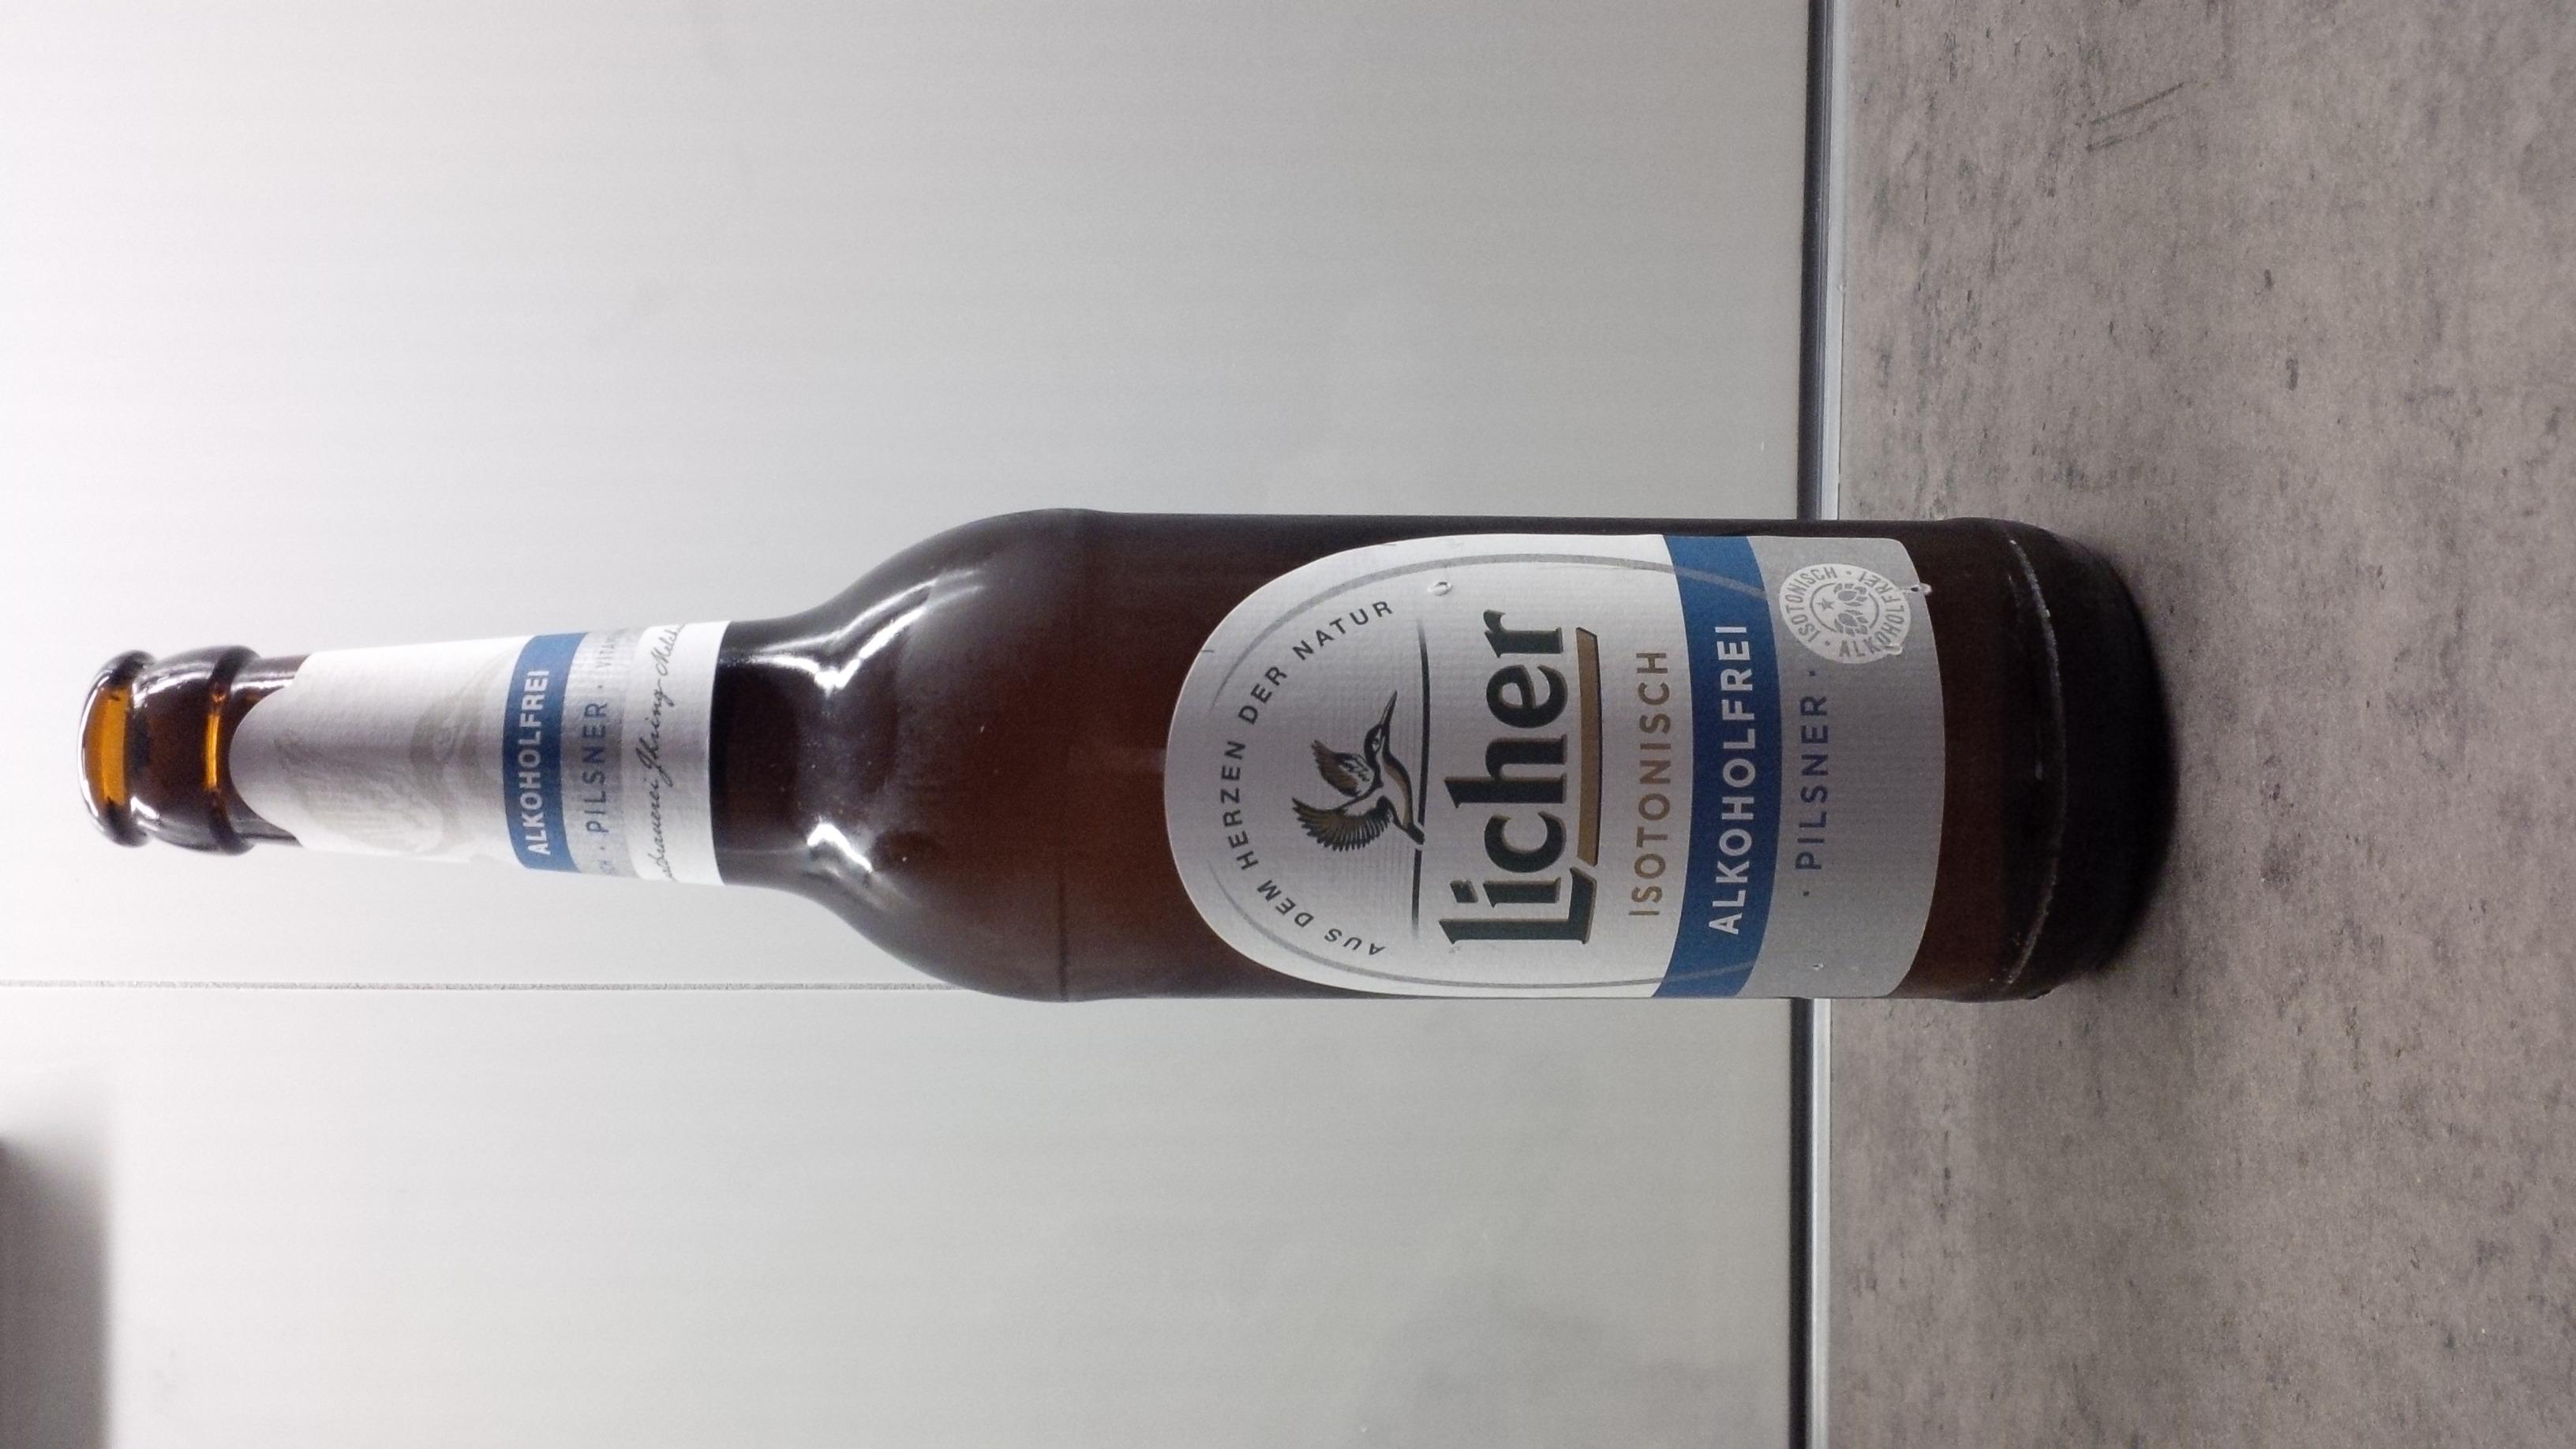 https://foodloader.net/VP_2019-12-30_Licher_Isotonisch_Alkoholfrei_Pilsner.jpg